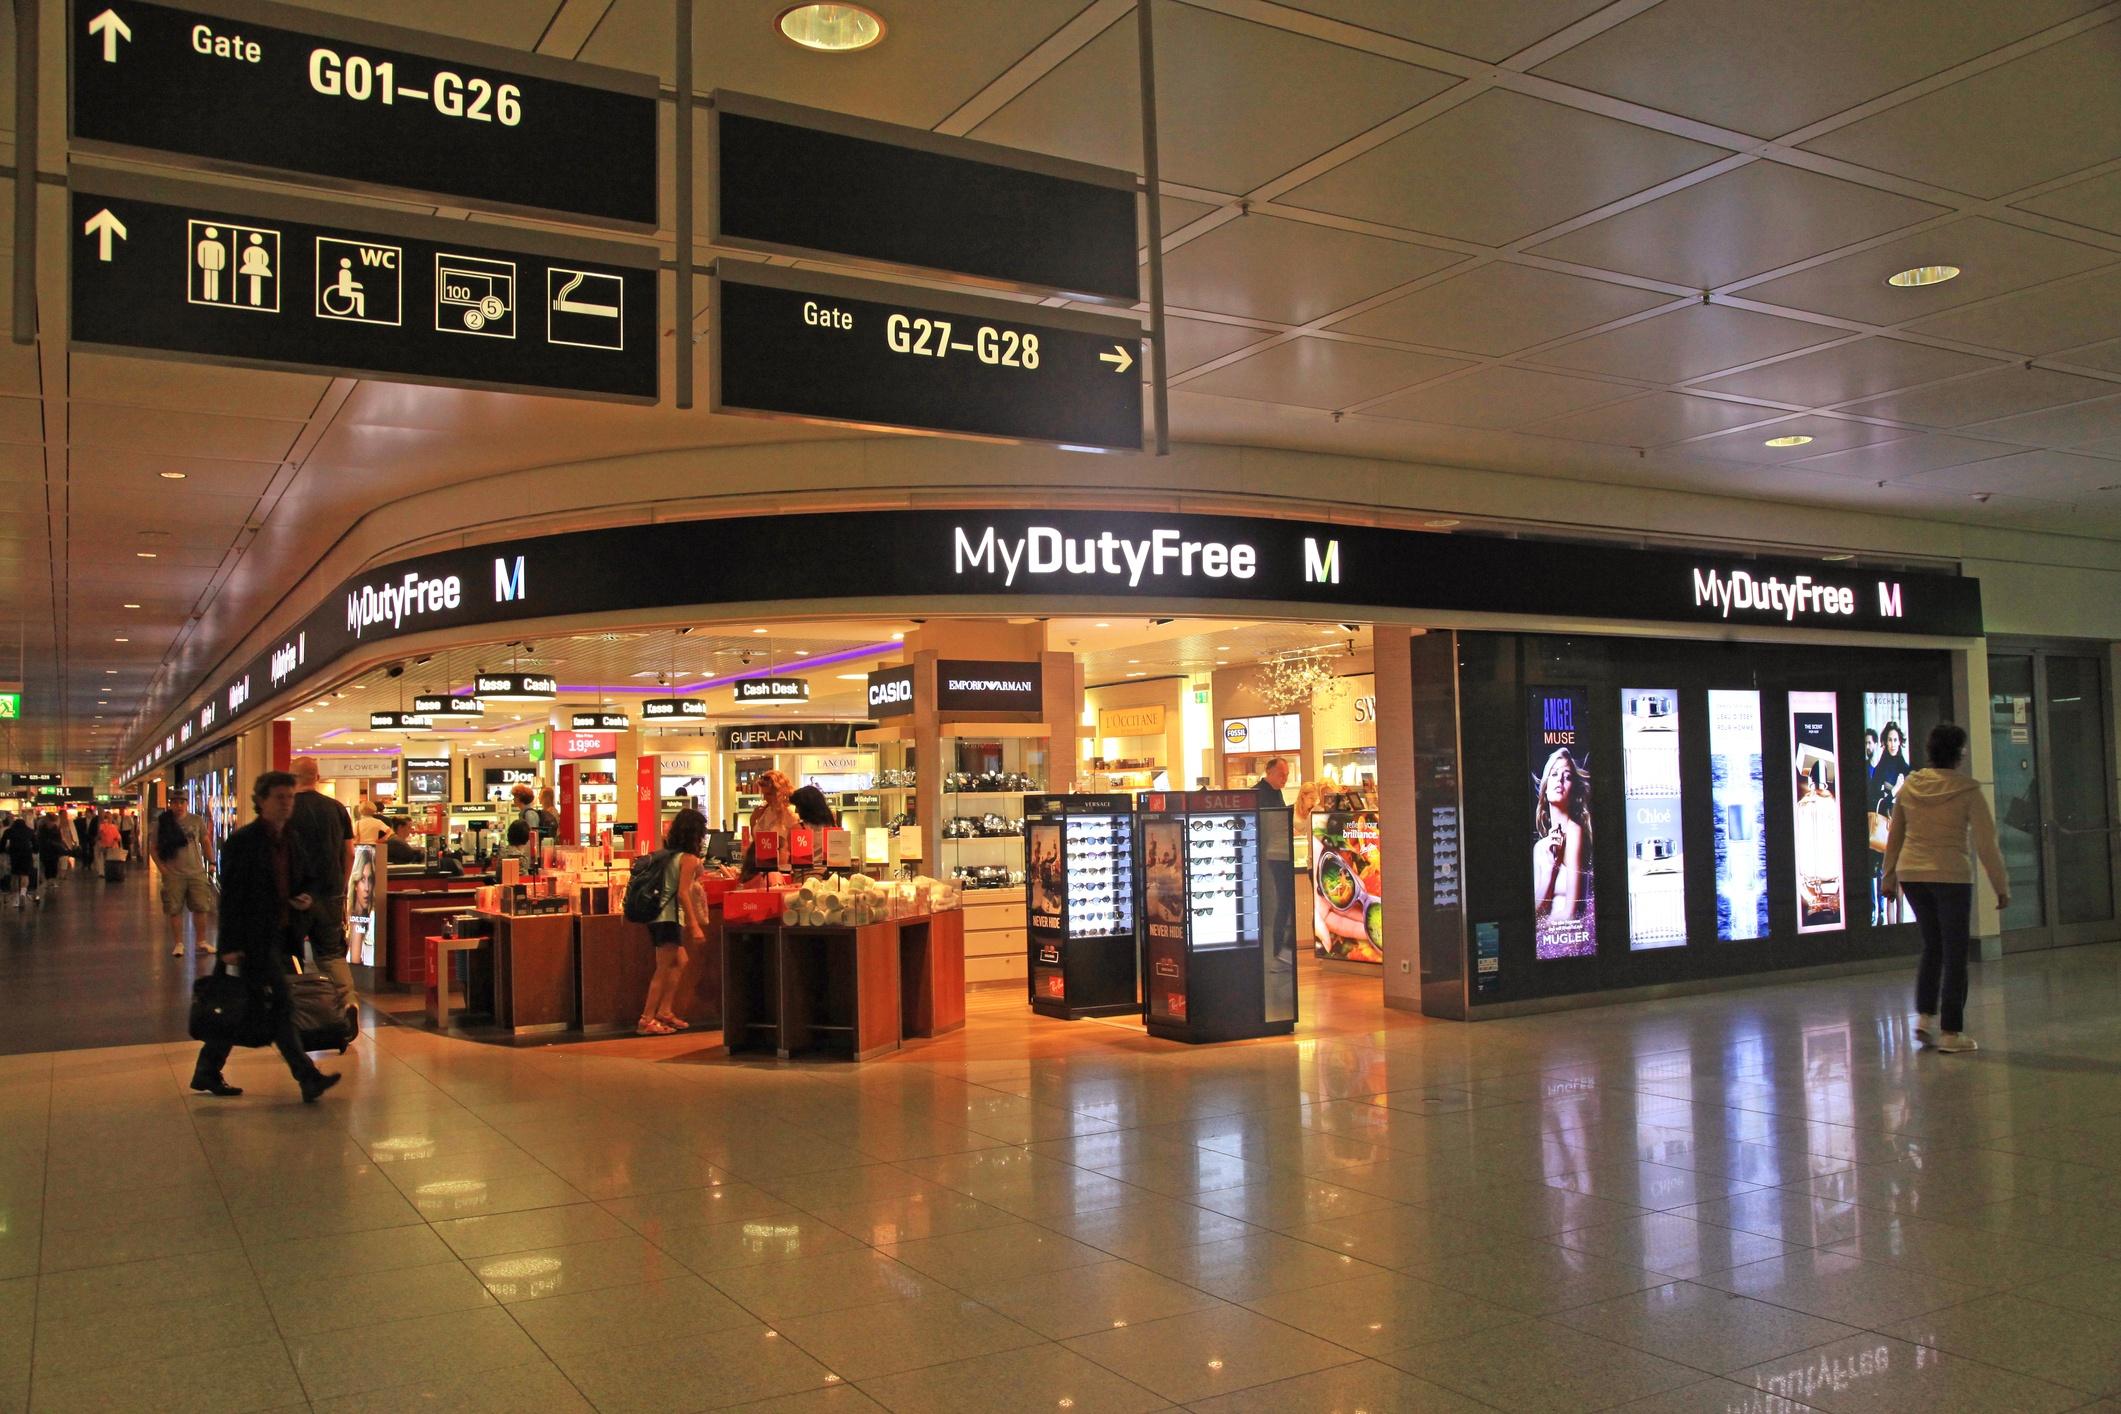 Duty free shop in airport, Munich, Germany.